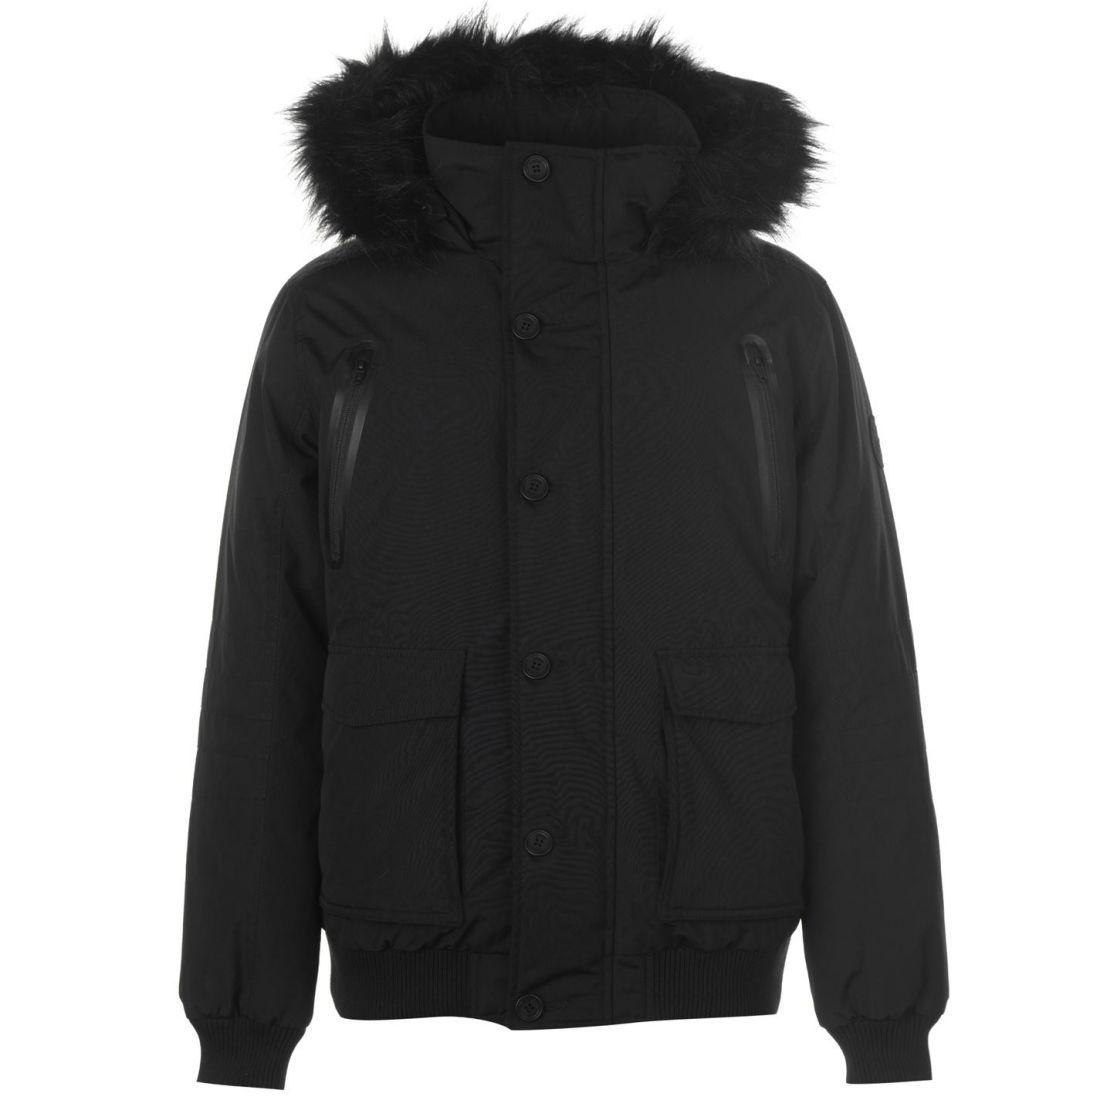 b024a523d Firetrap Mens Down Bomber Jacket Puffer Coat Top Long Sleeve Hooded ...